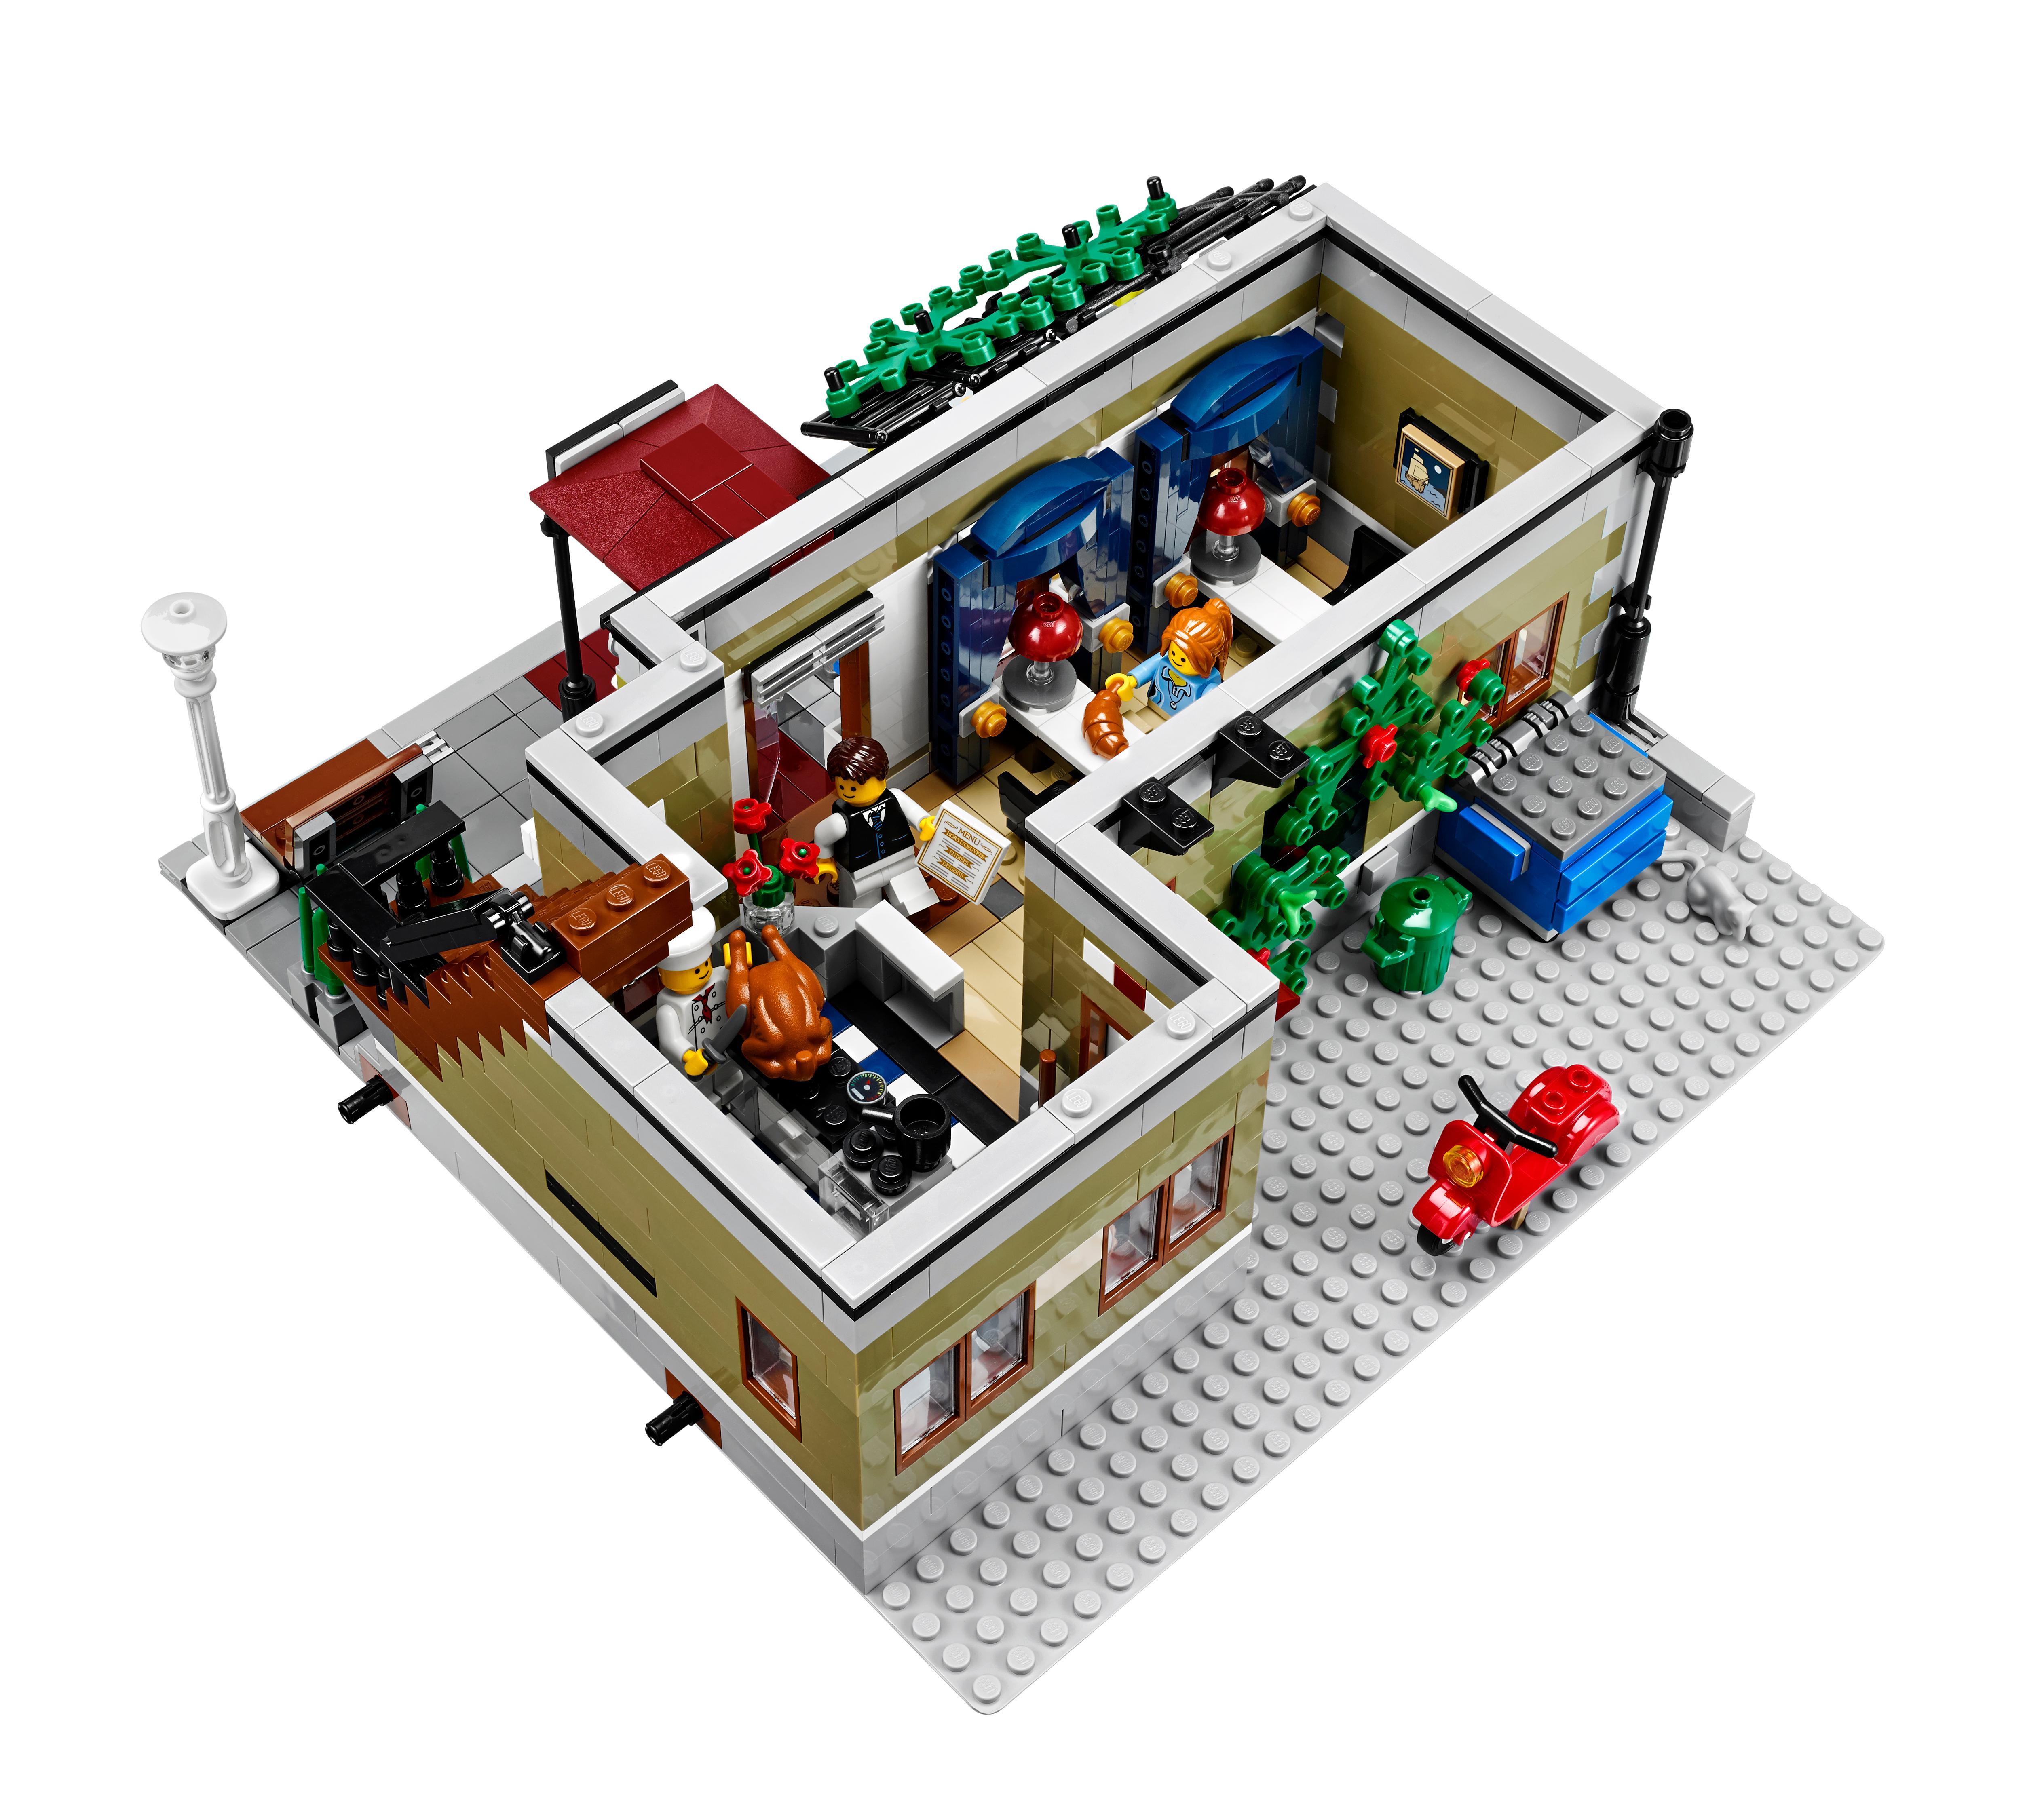 Amazon LEGO Creator Expert Parisian Restaurant Toys